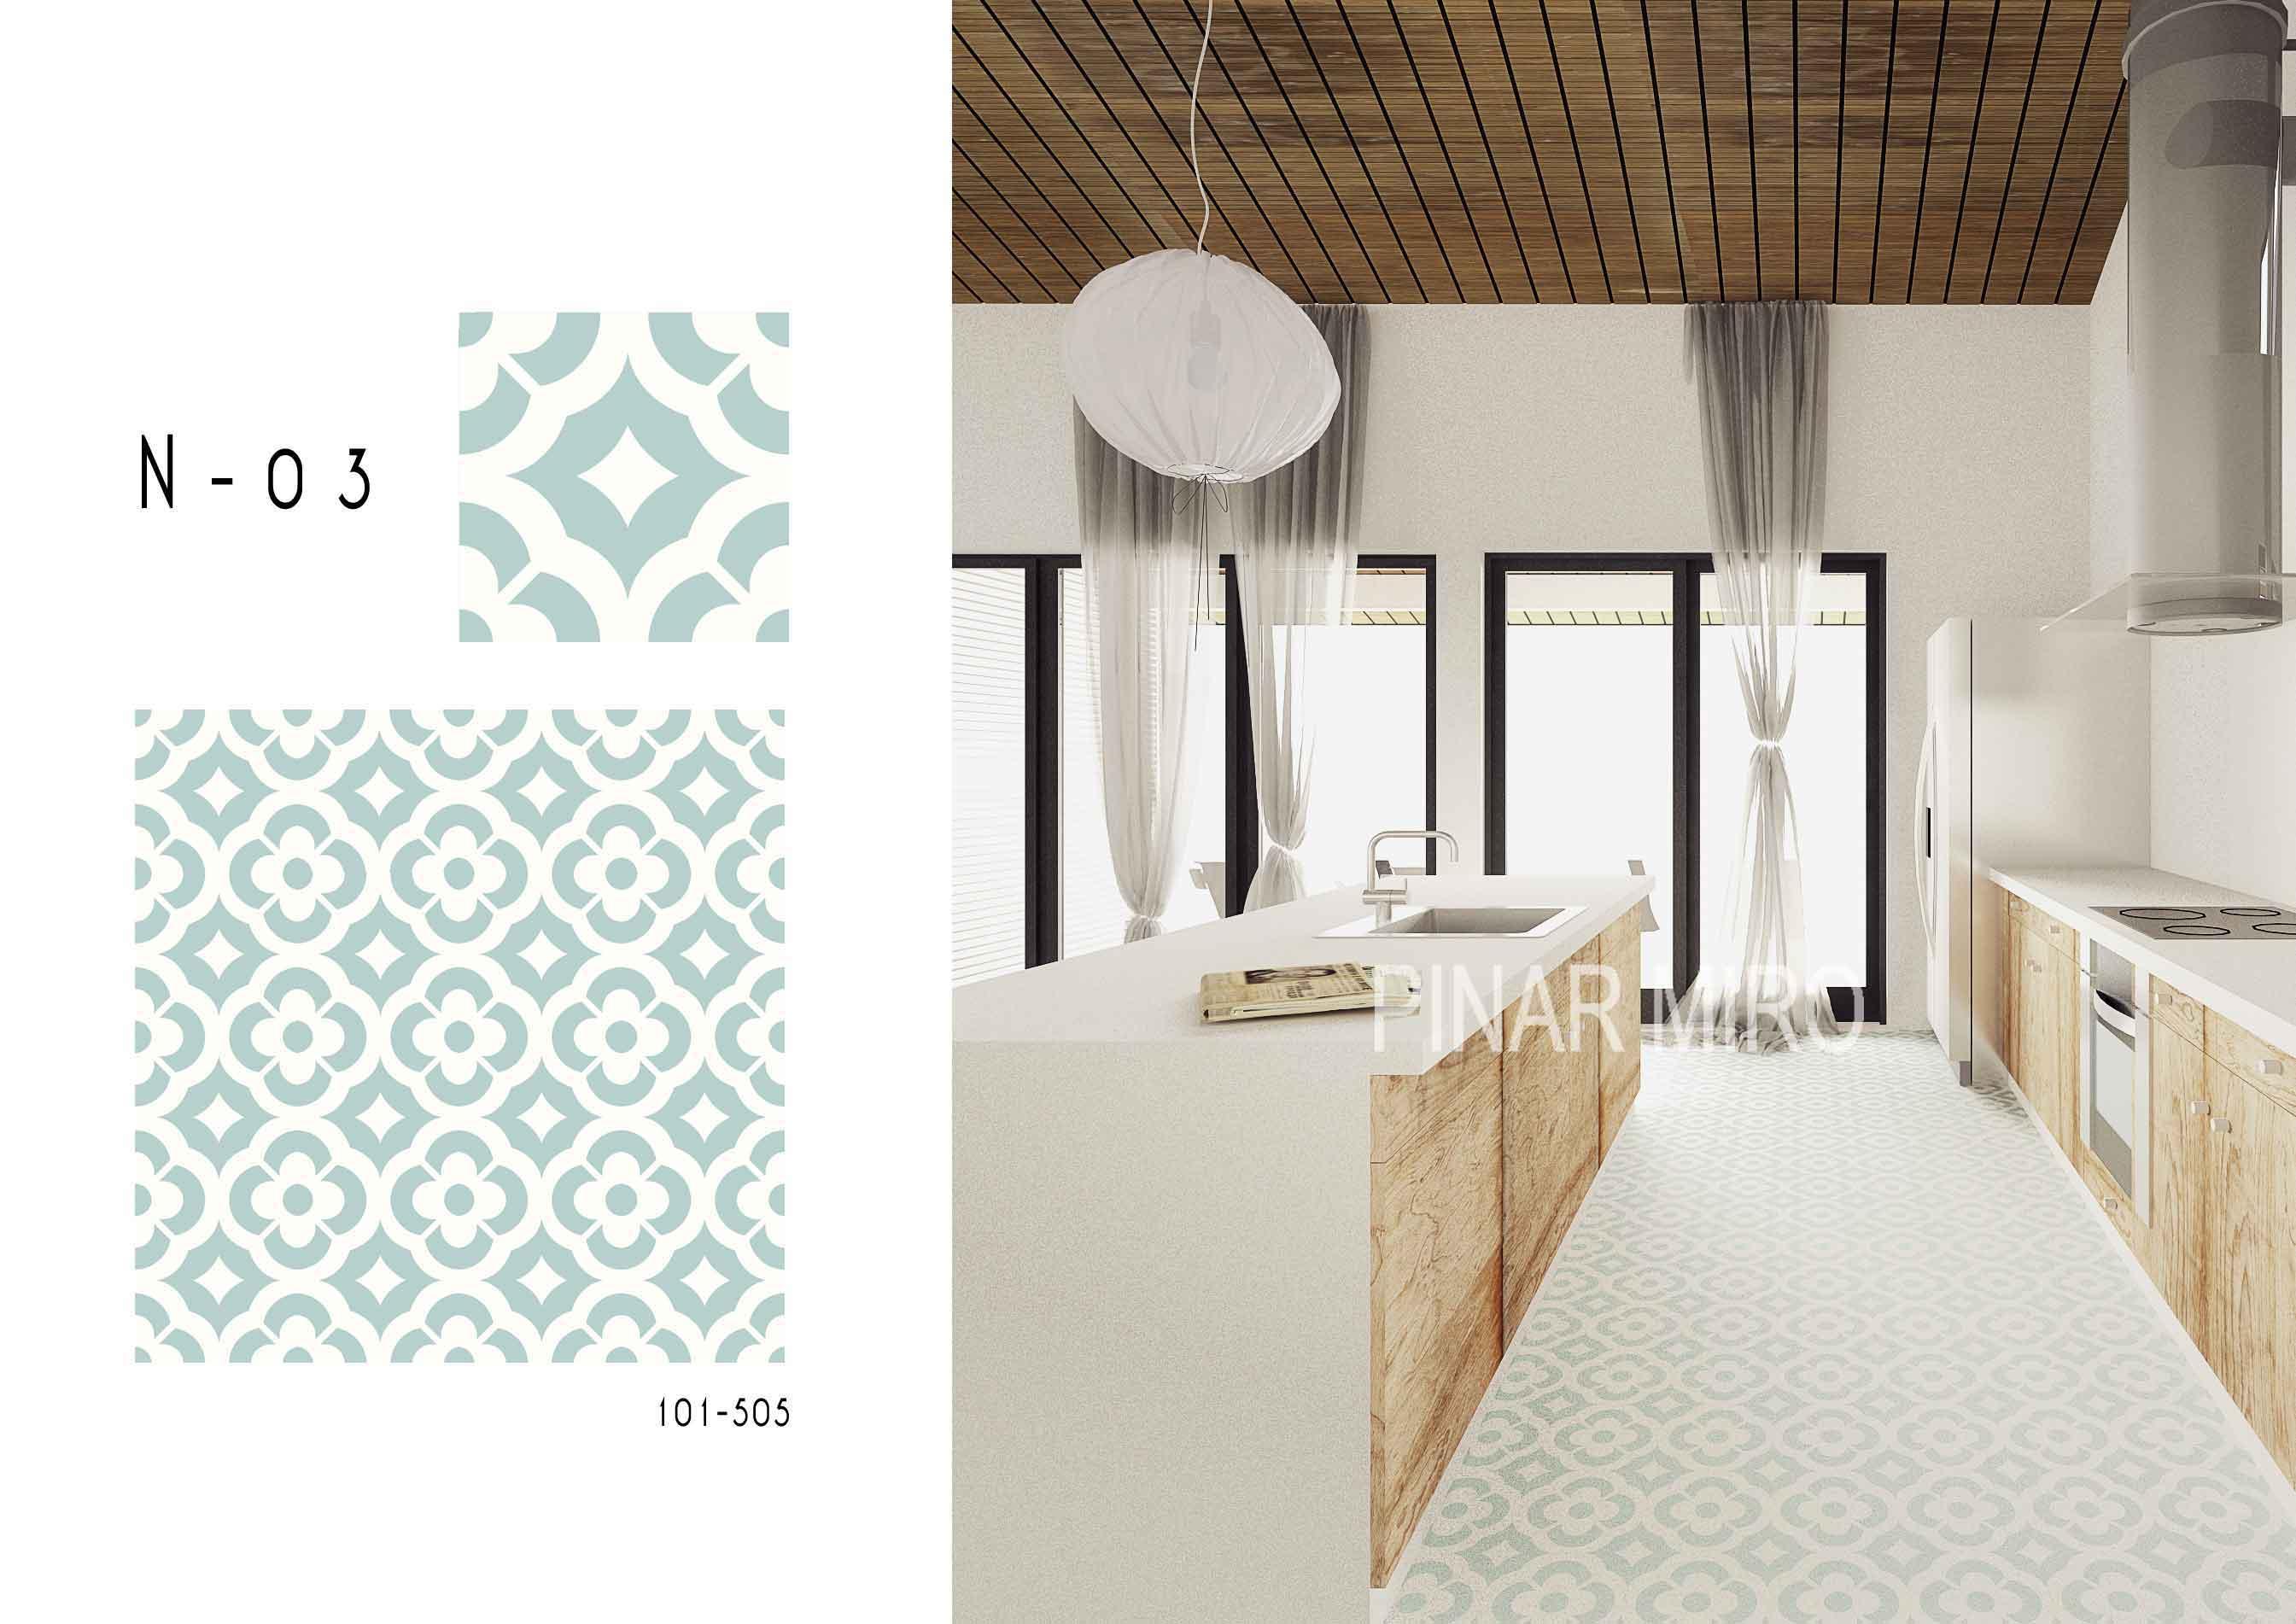 3-n03-pinar-miro-cement-tiles